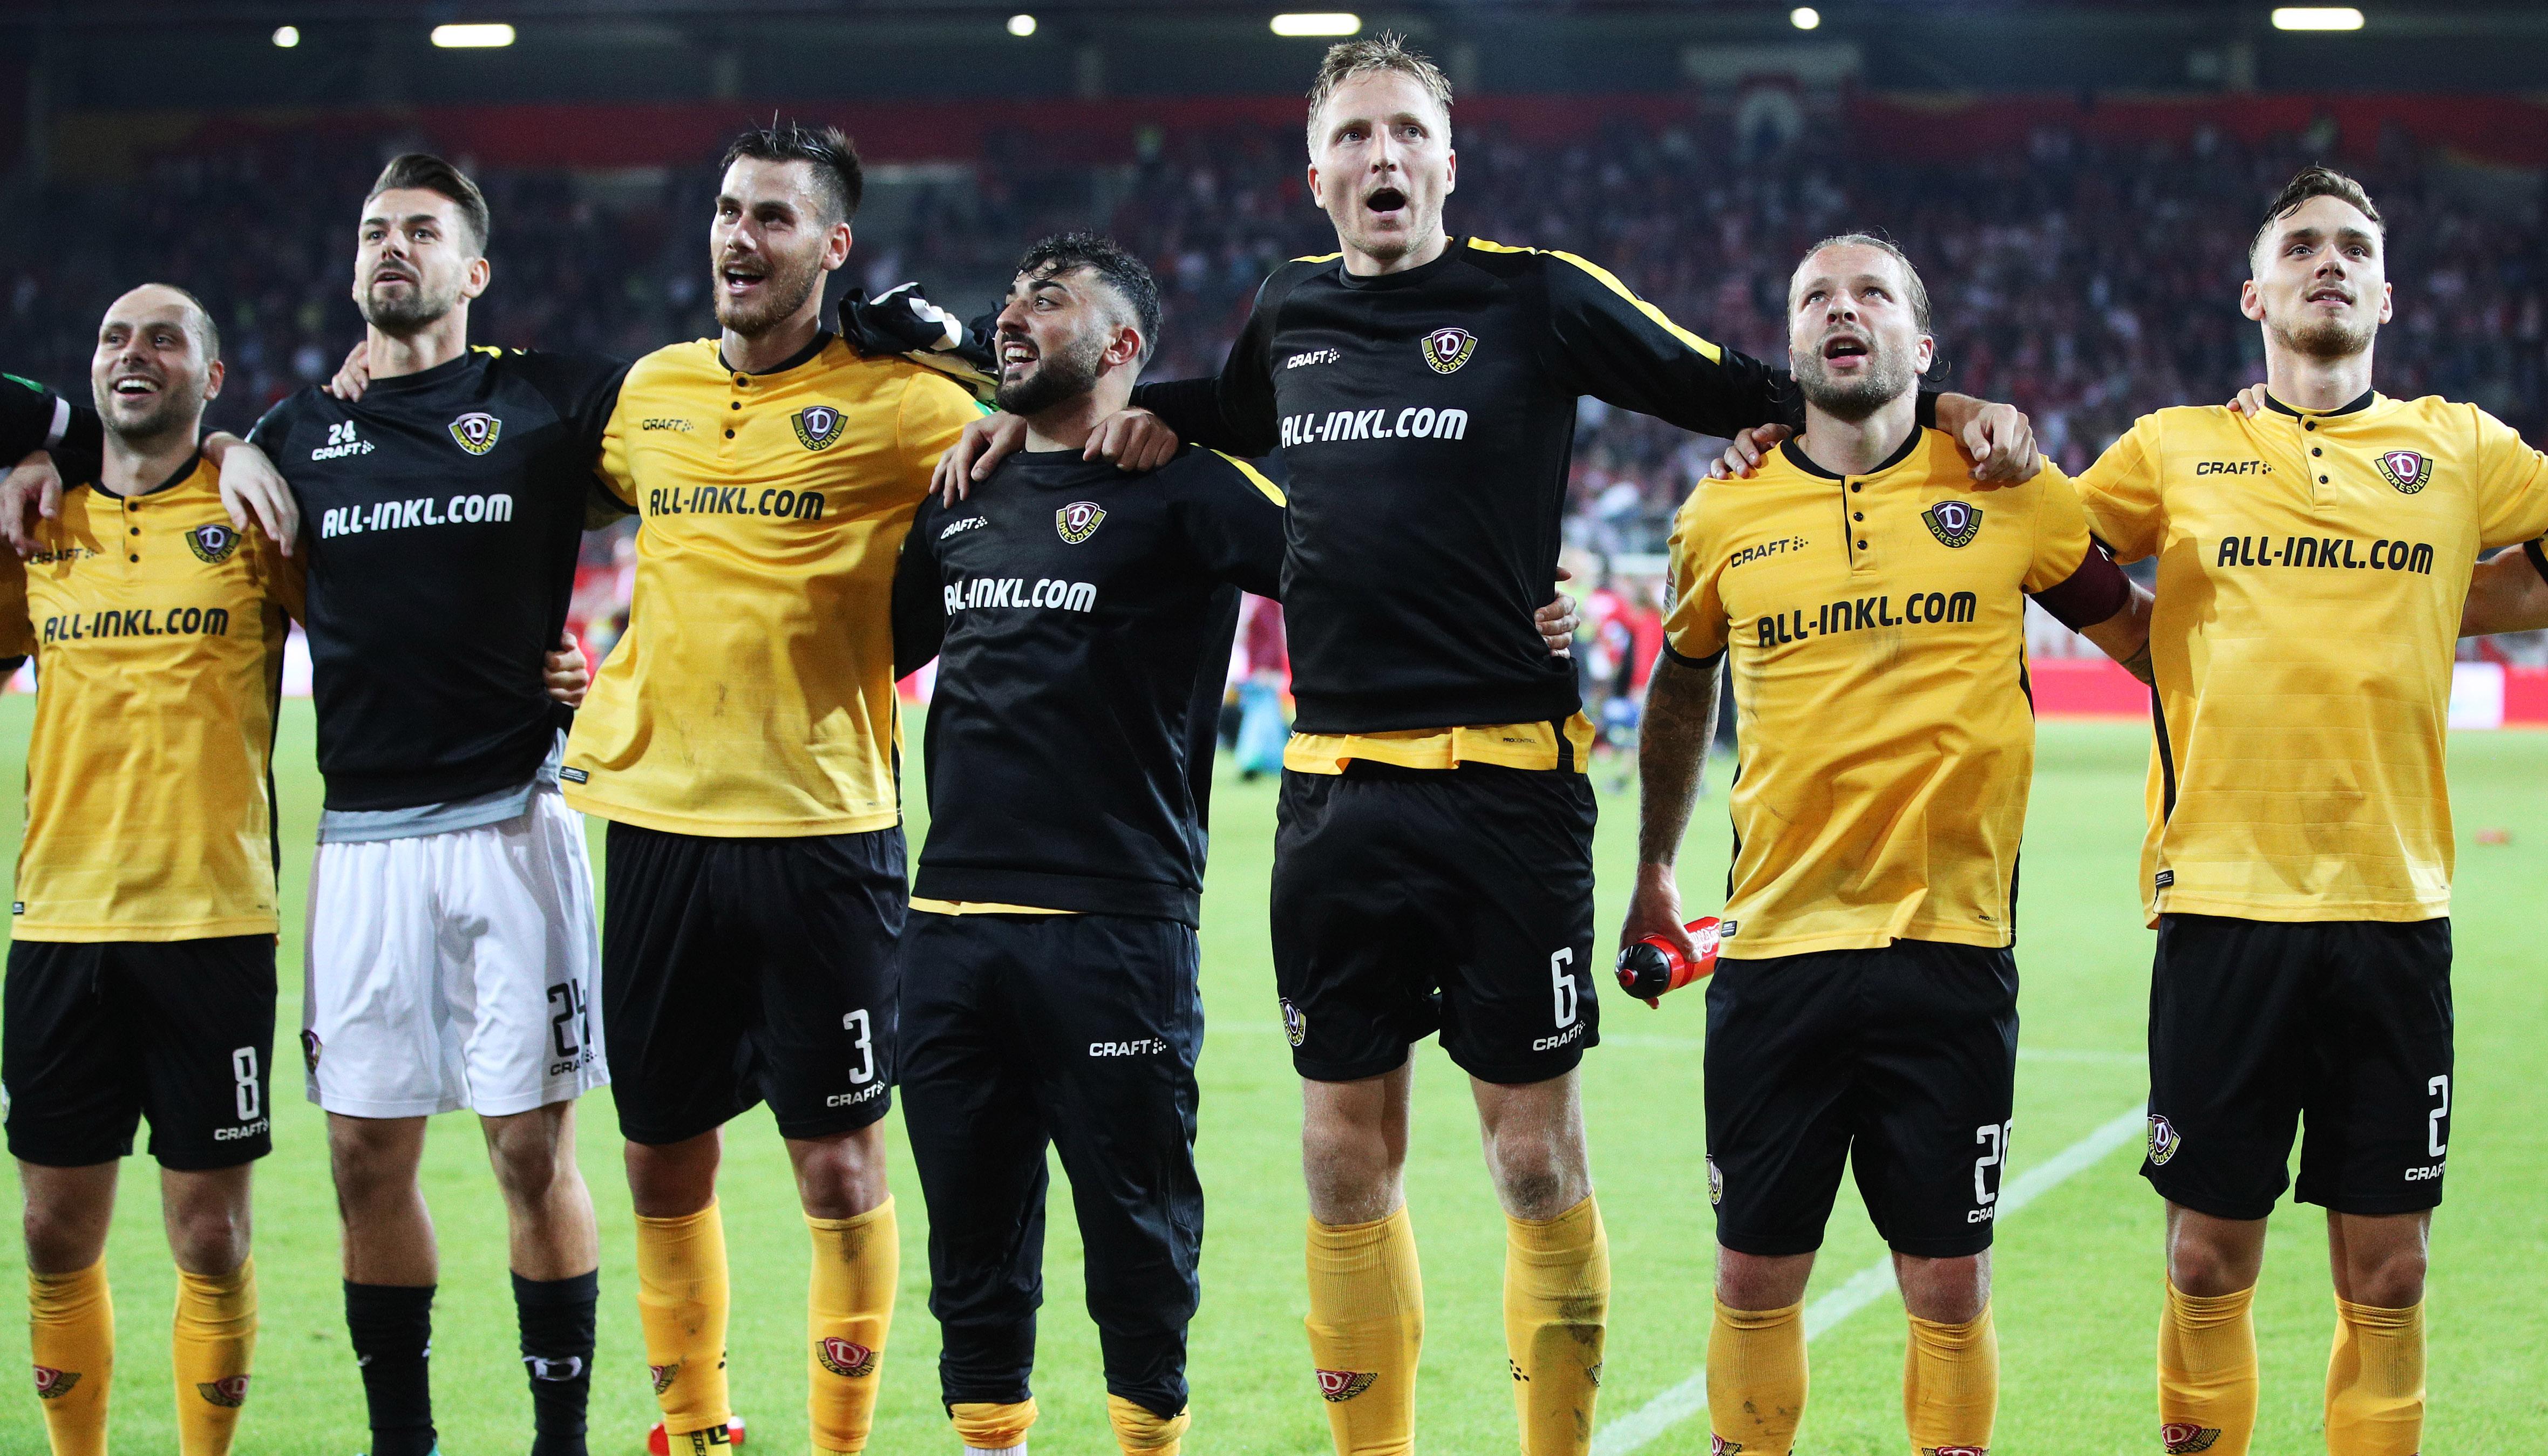 Dynamo Dresden – HSV: Wer festigt den Aufwärtstrend?